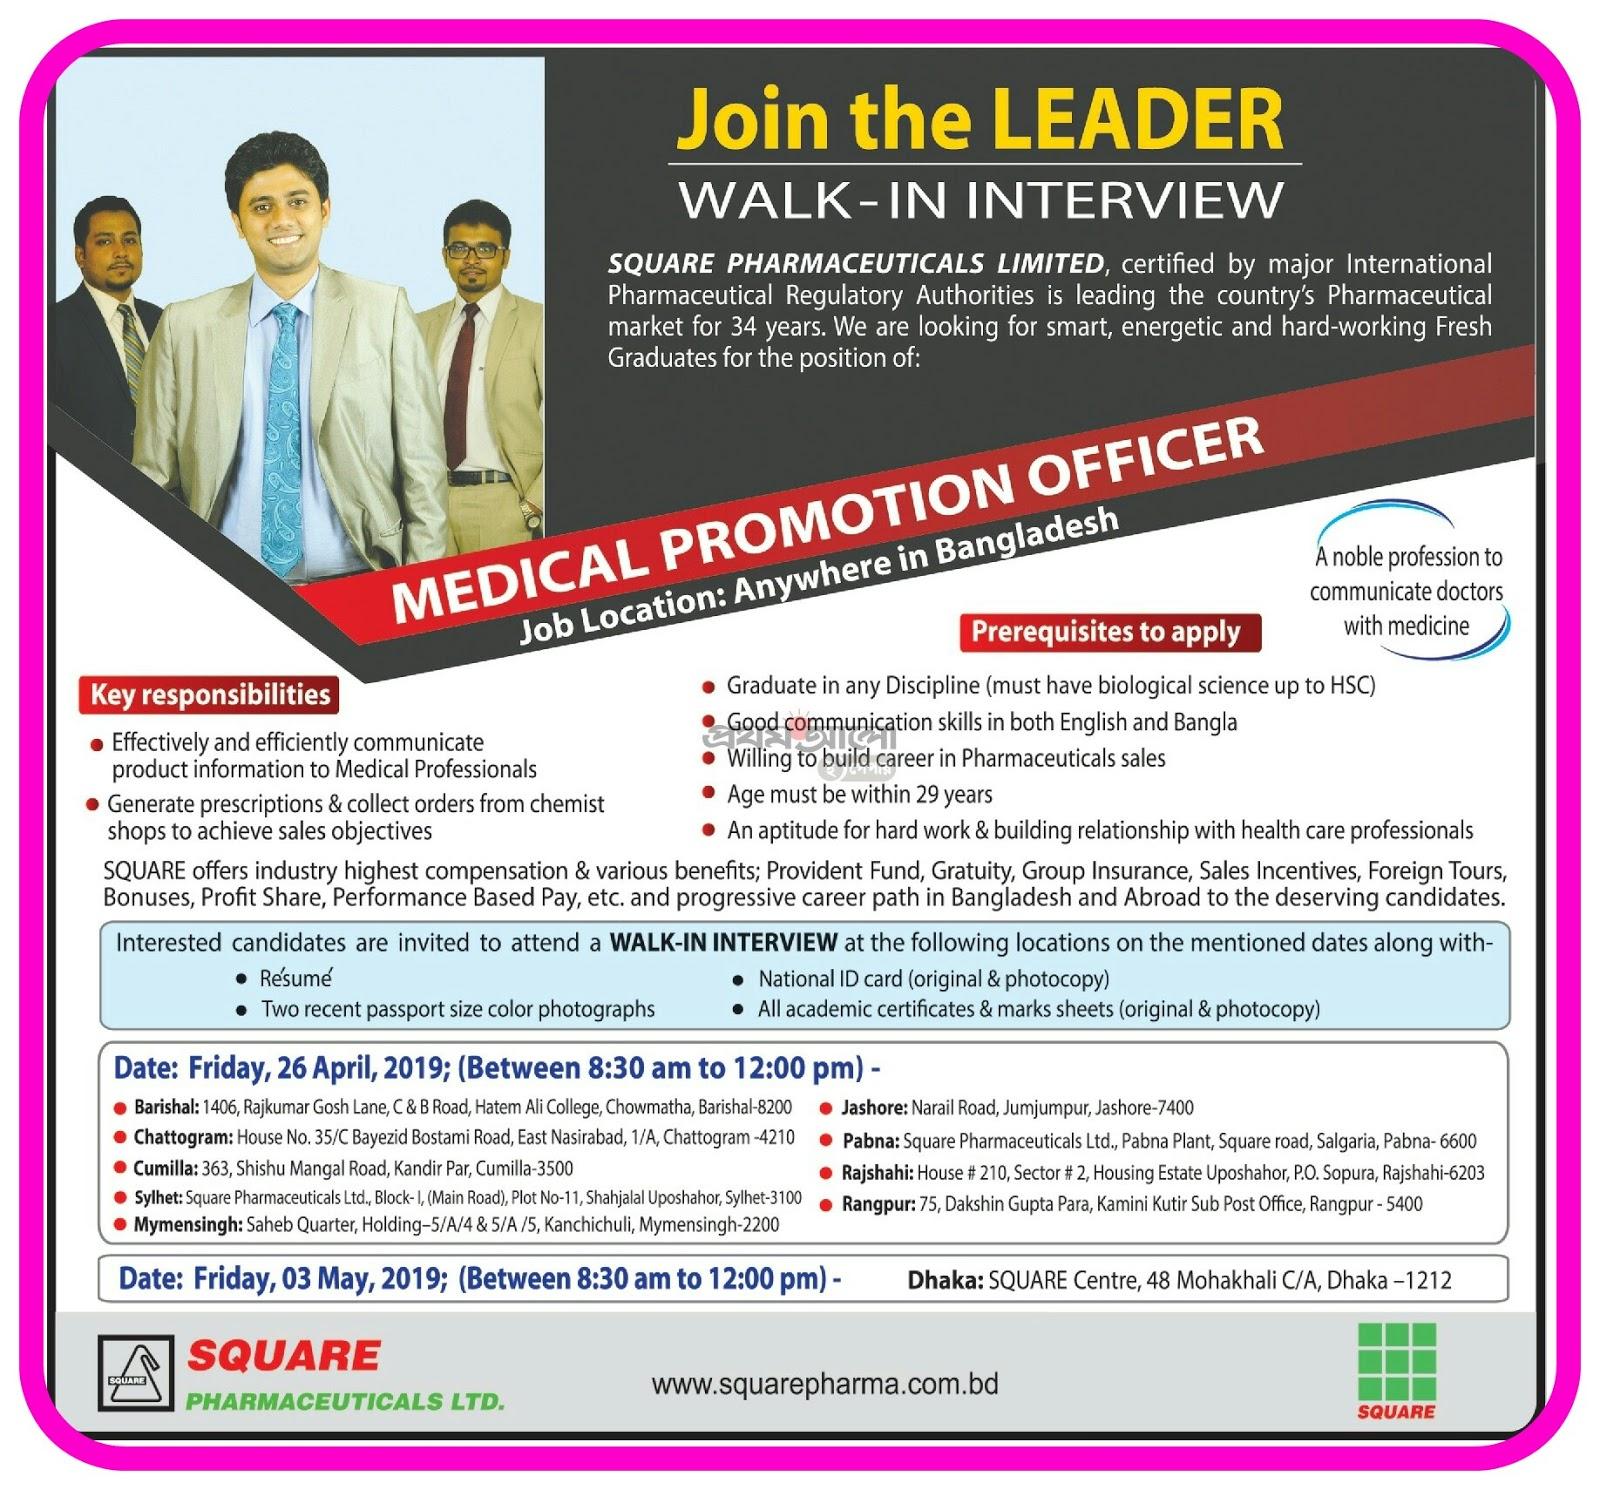 Squre Pharmaceuticals job circuler published 21 Afril 2019